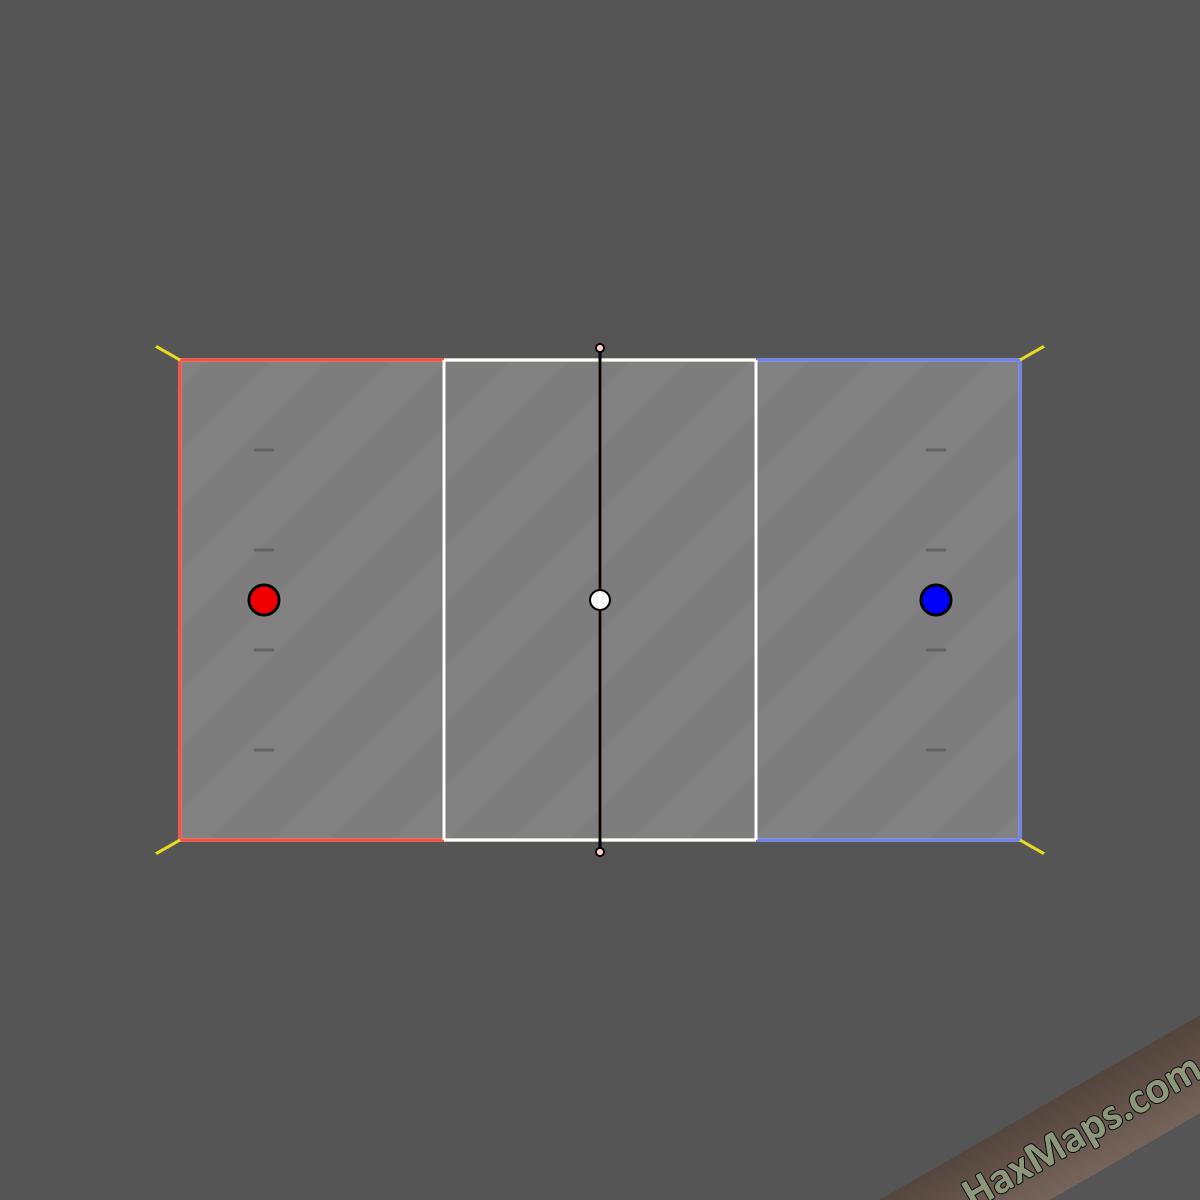 hax ball maps   Volleyball v4   Leo